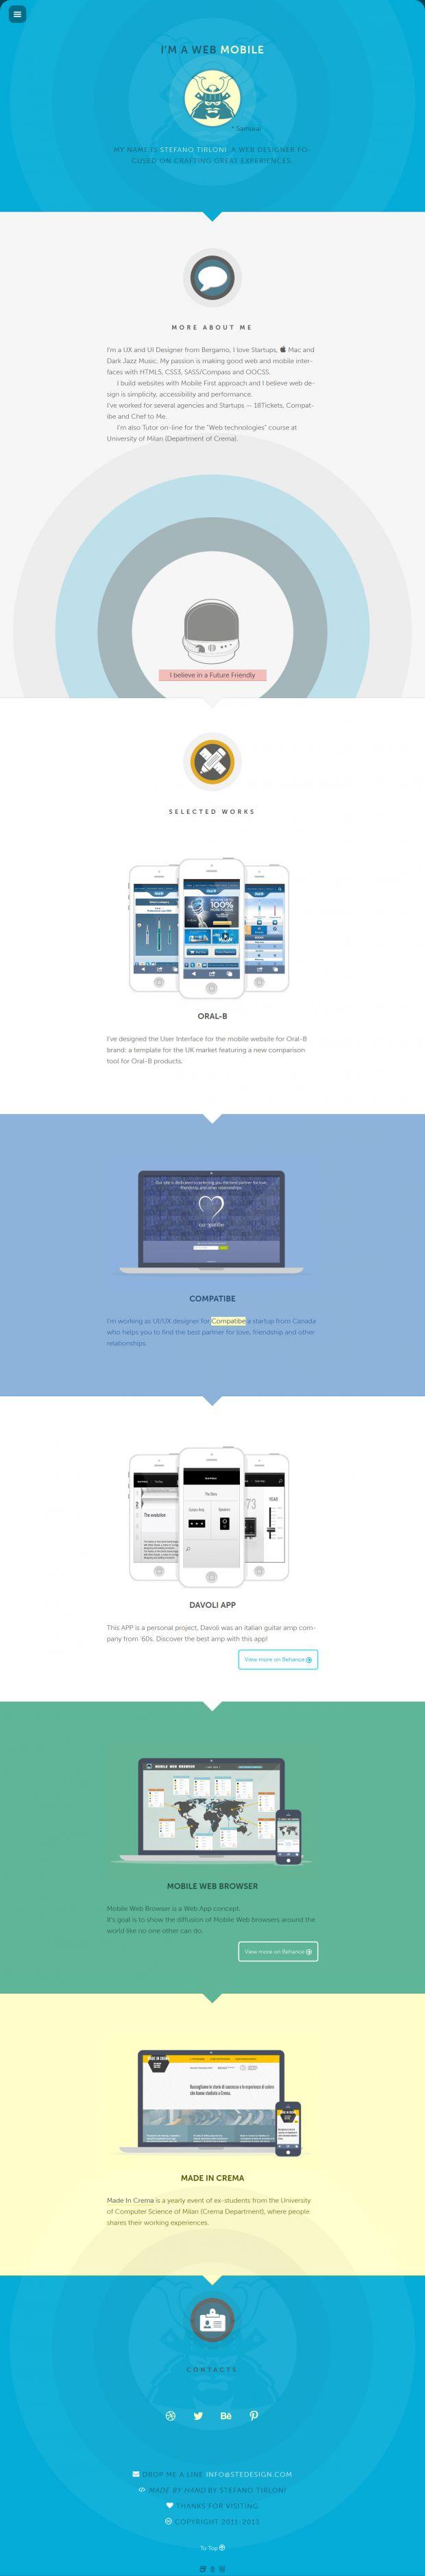 Stedesign Mobile First Design Webdesign Inspiration Www Niceoneilike Com Web Design Gallery Web Design Web Design Inspiration